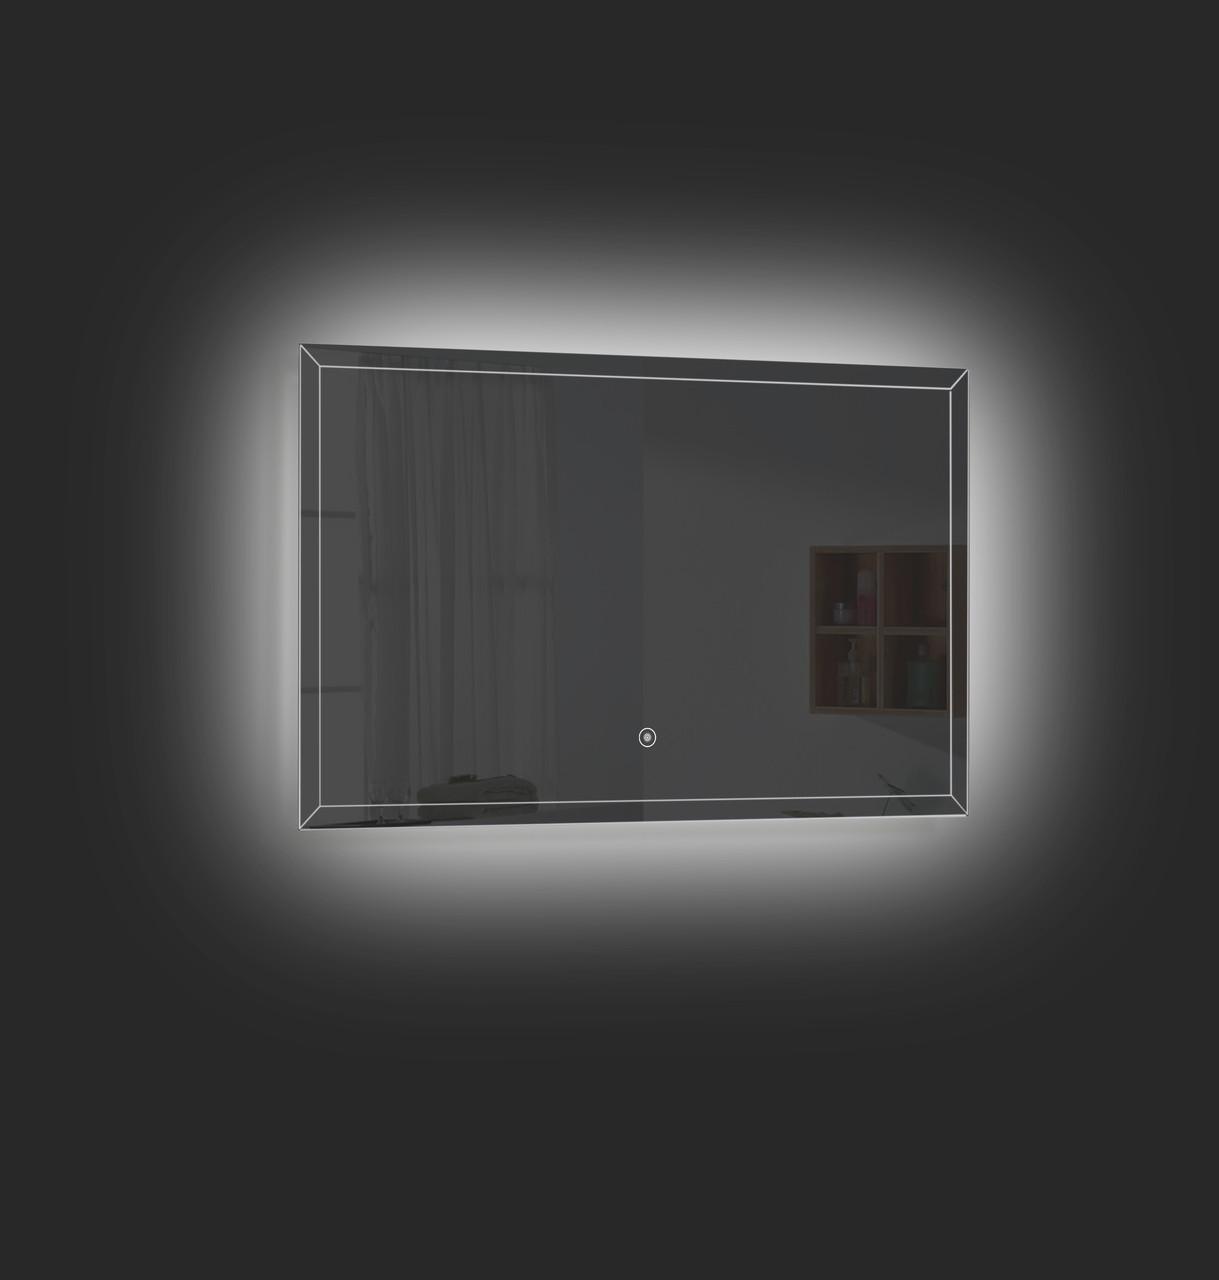 Fero 36 Inch Wall Mounted Bathroom Mirror With Led Light